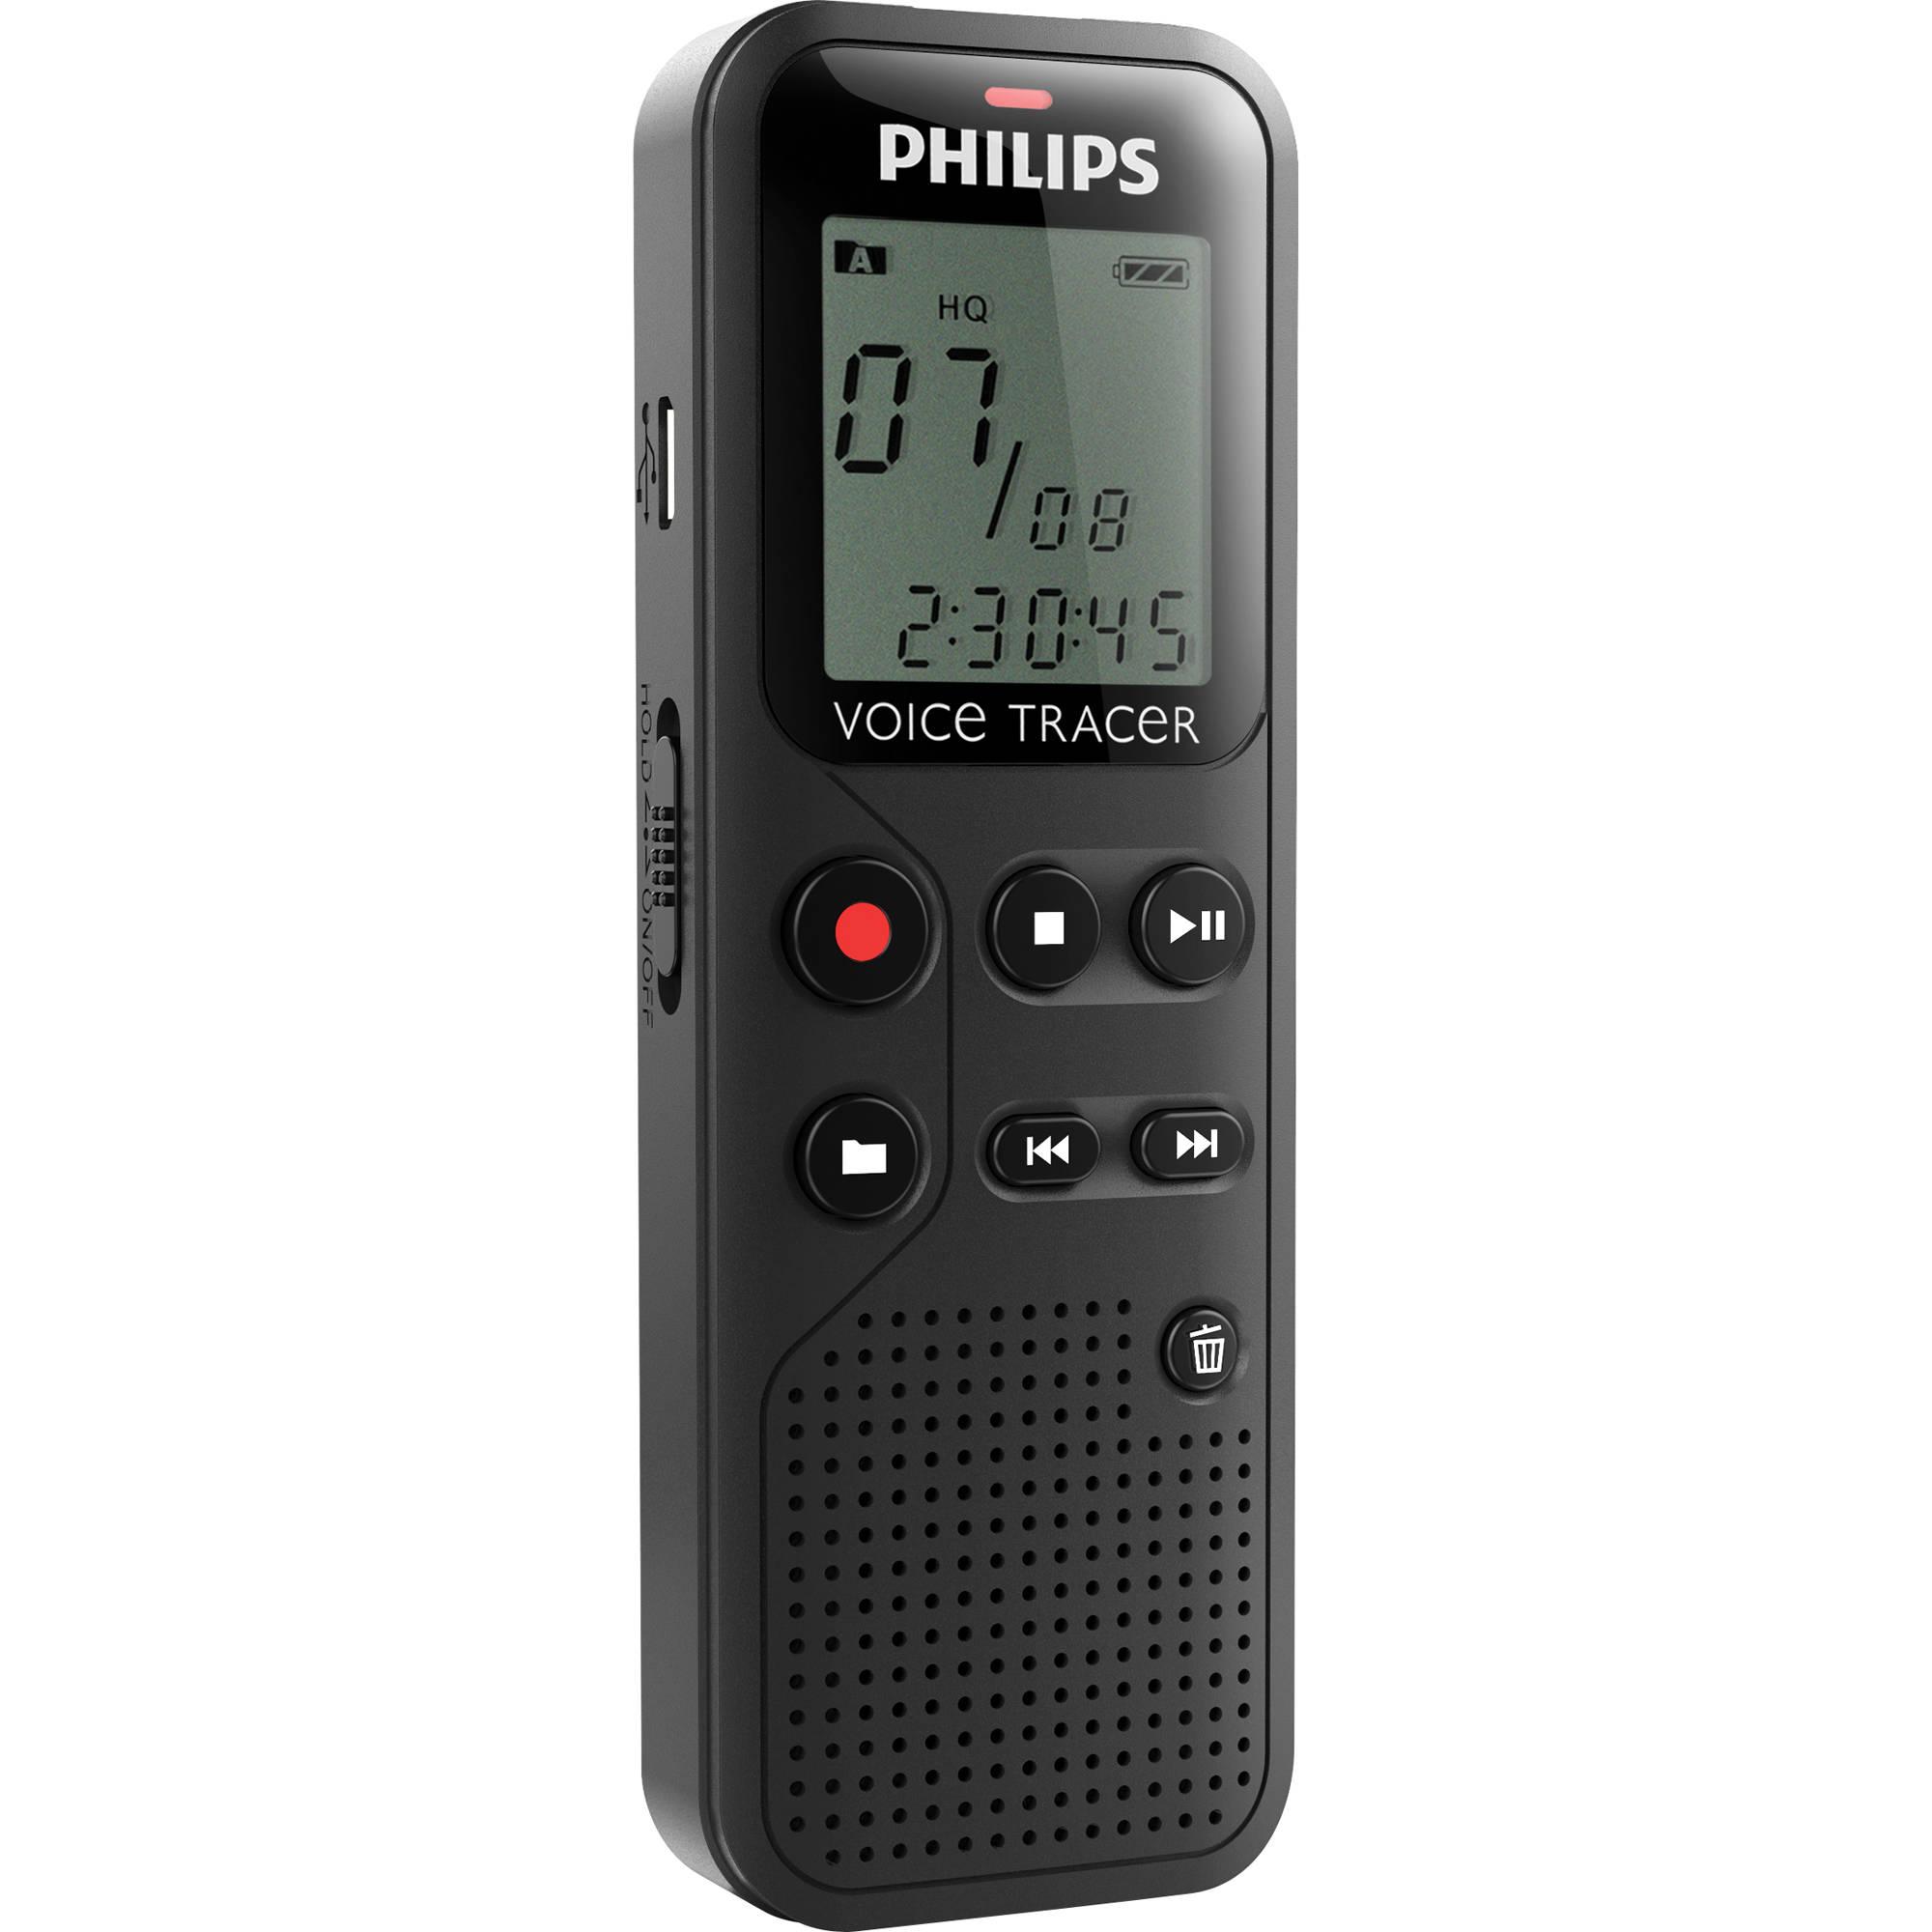 Philips 4gb Voice Tracer 1100 Digital Recorder Dvt1100 00 Bh Free Ongkir Dry Iron Hi 1172